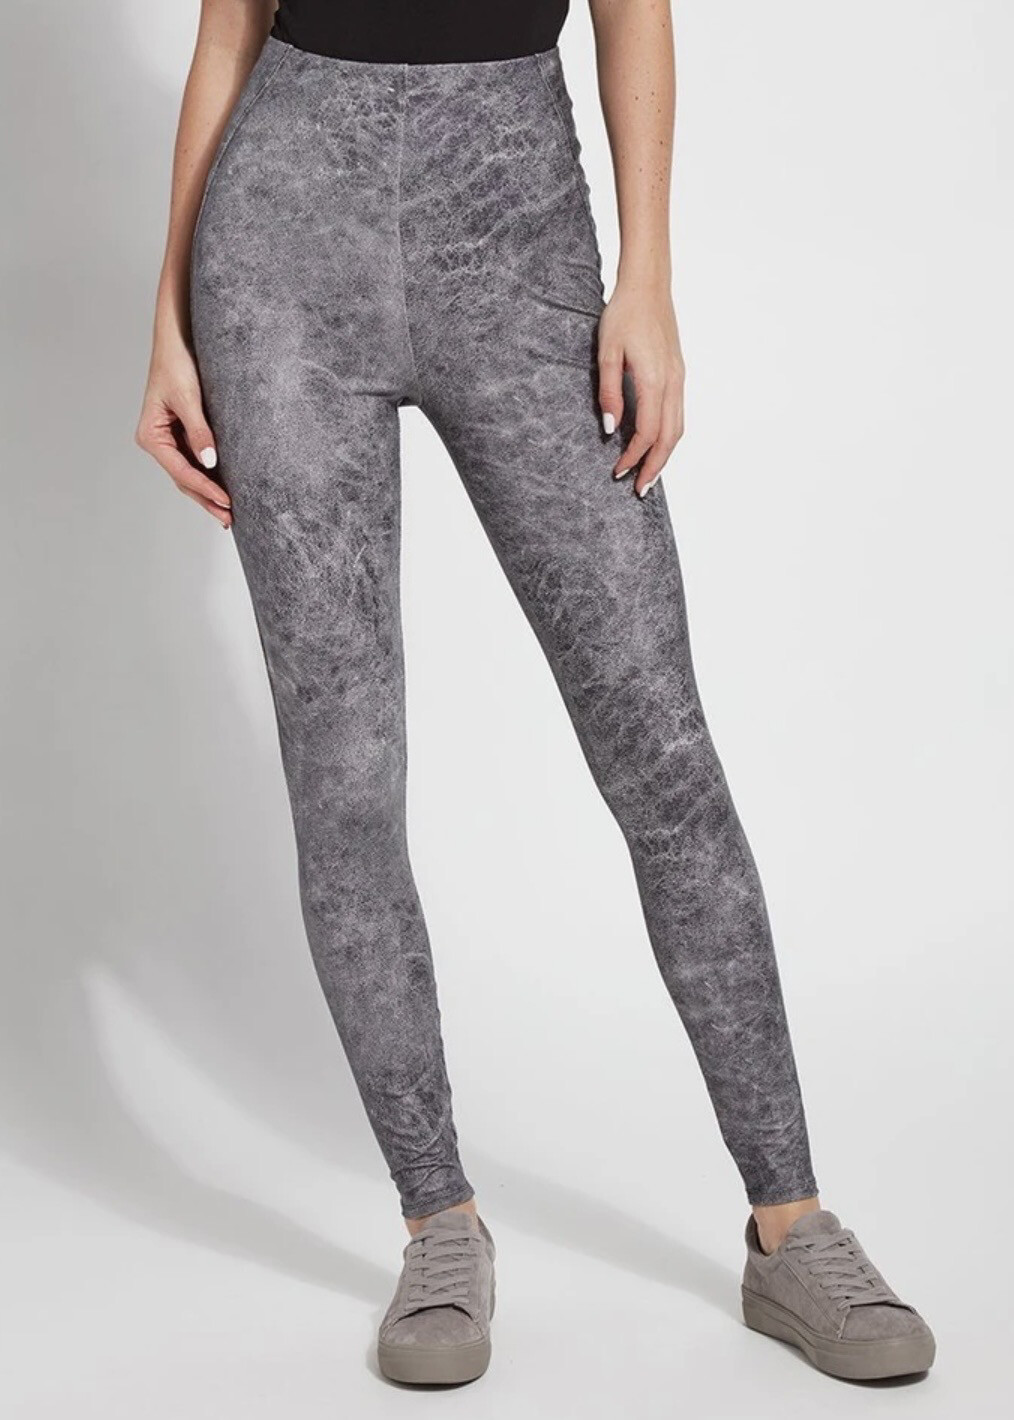 Grey Foil Legging